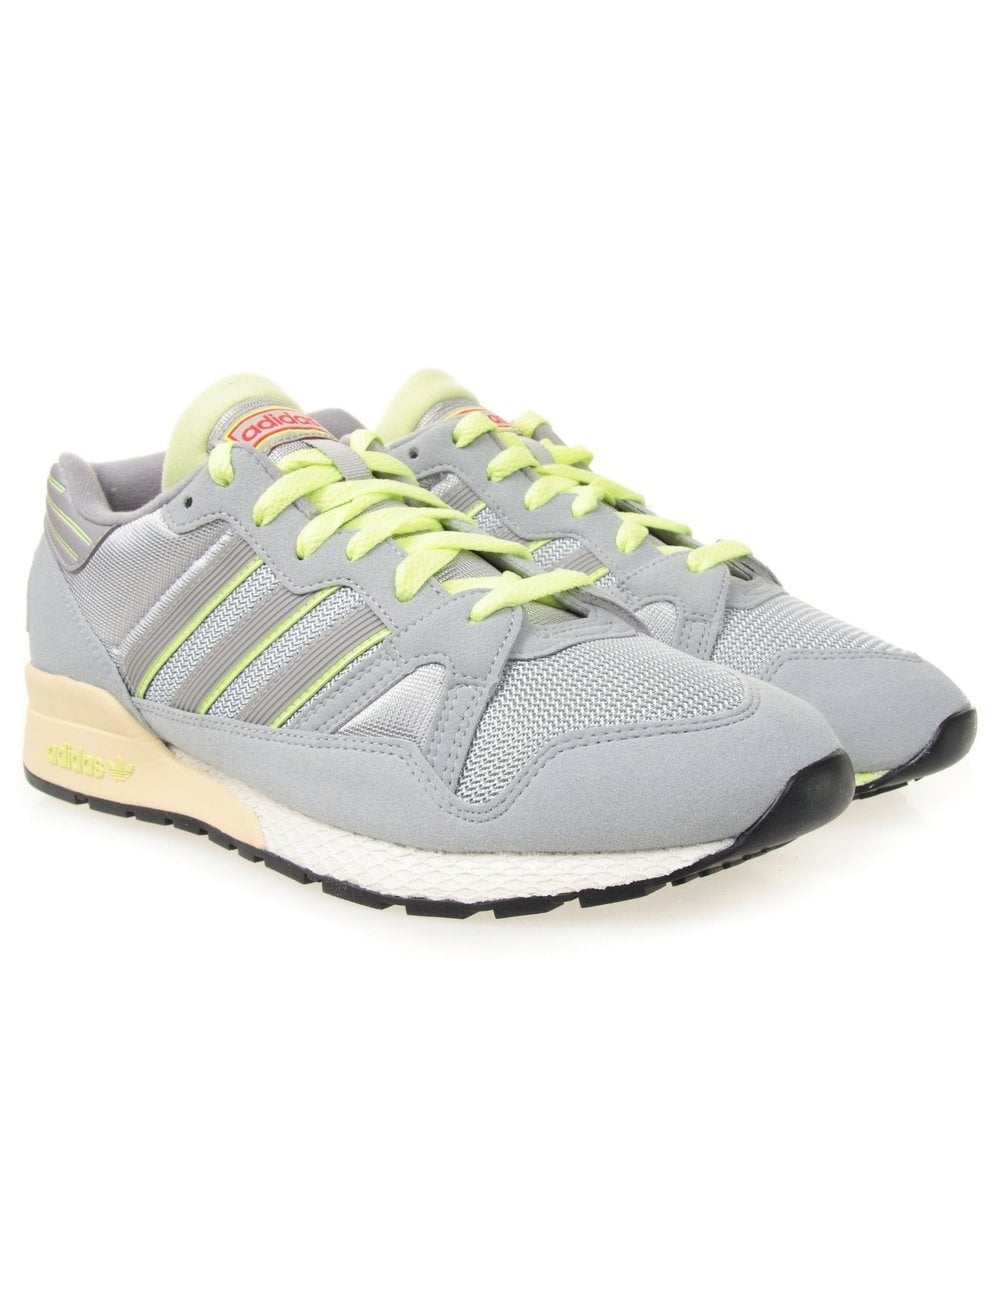 24347ff6f Adidas Originals ZX 710 Shoes - Ice Grey - Footwear from Fat Buddha ...